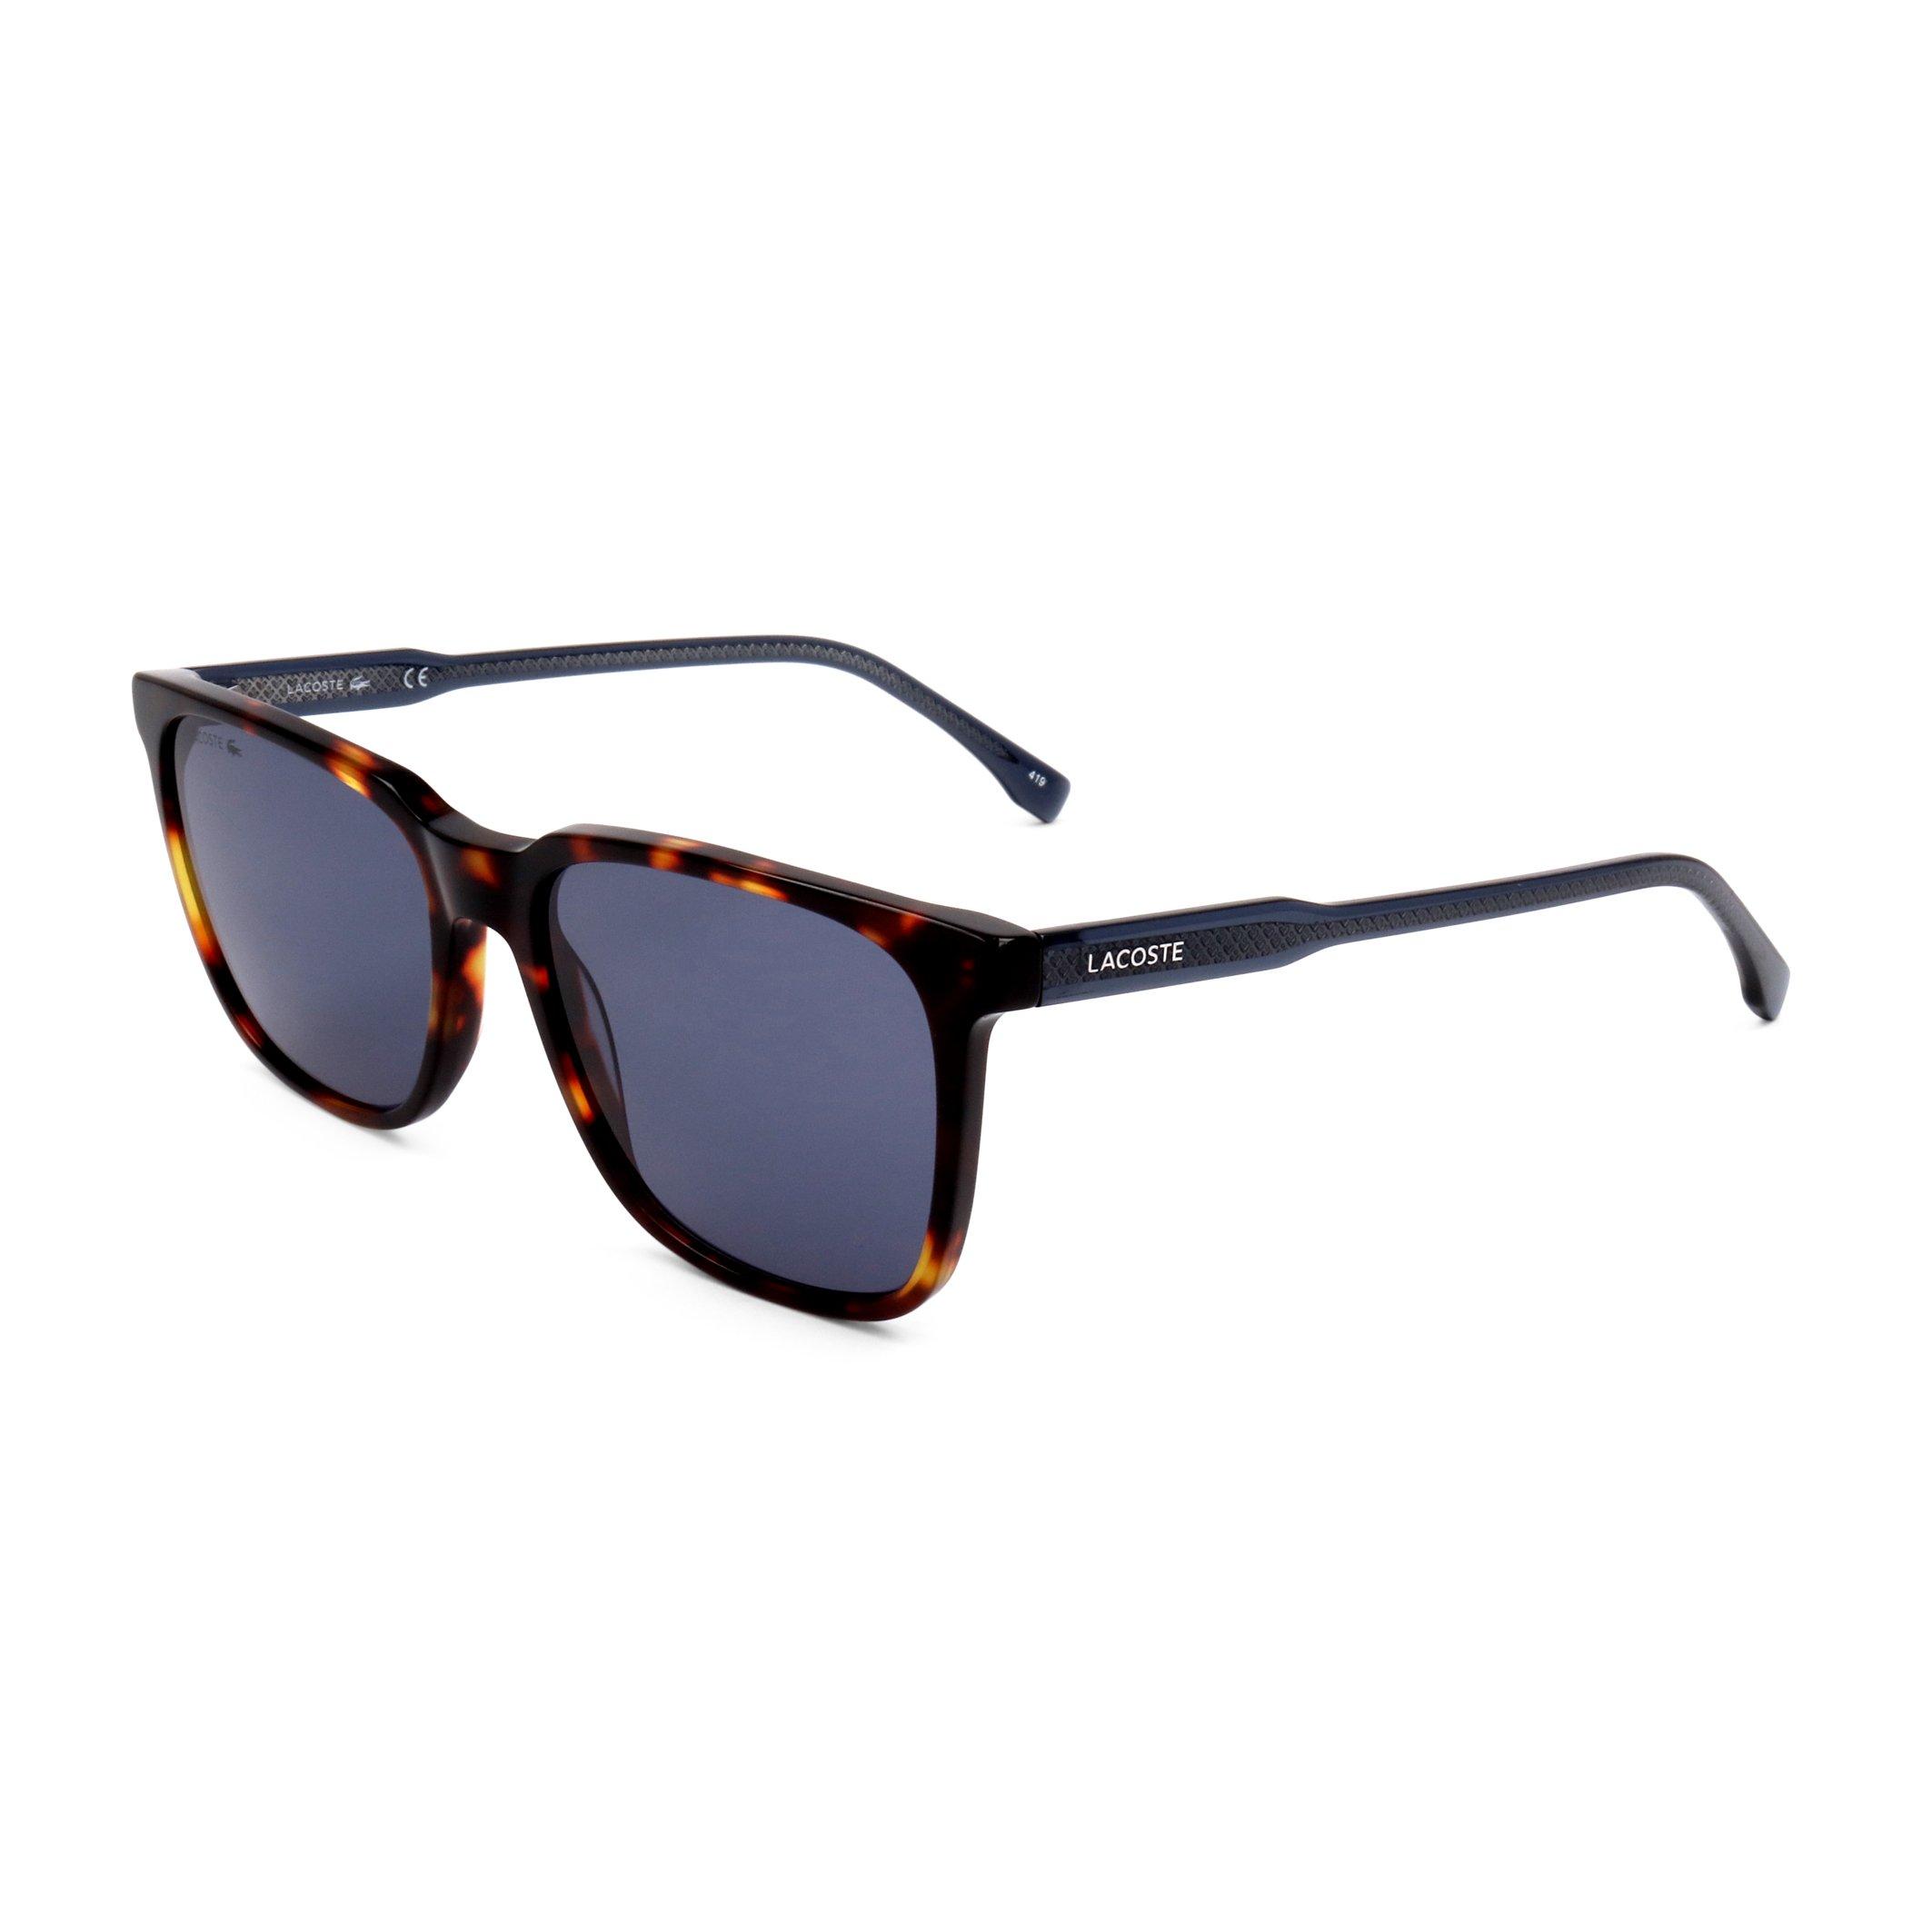 Lacoste Women's Sunglasses Brown L910S - brown-2 NOSIZE